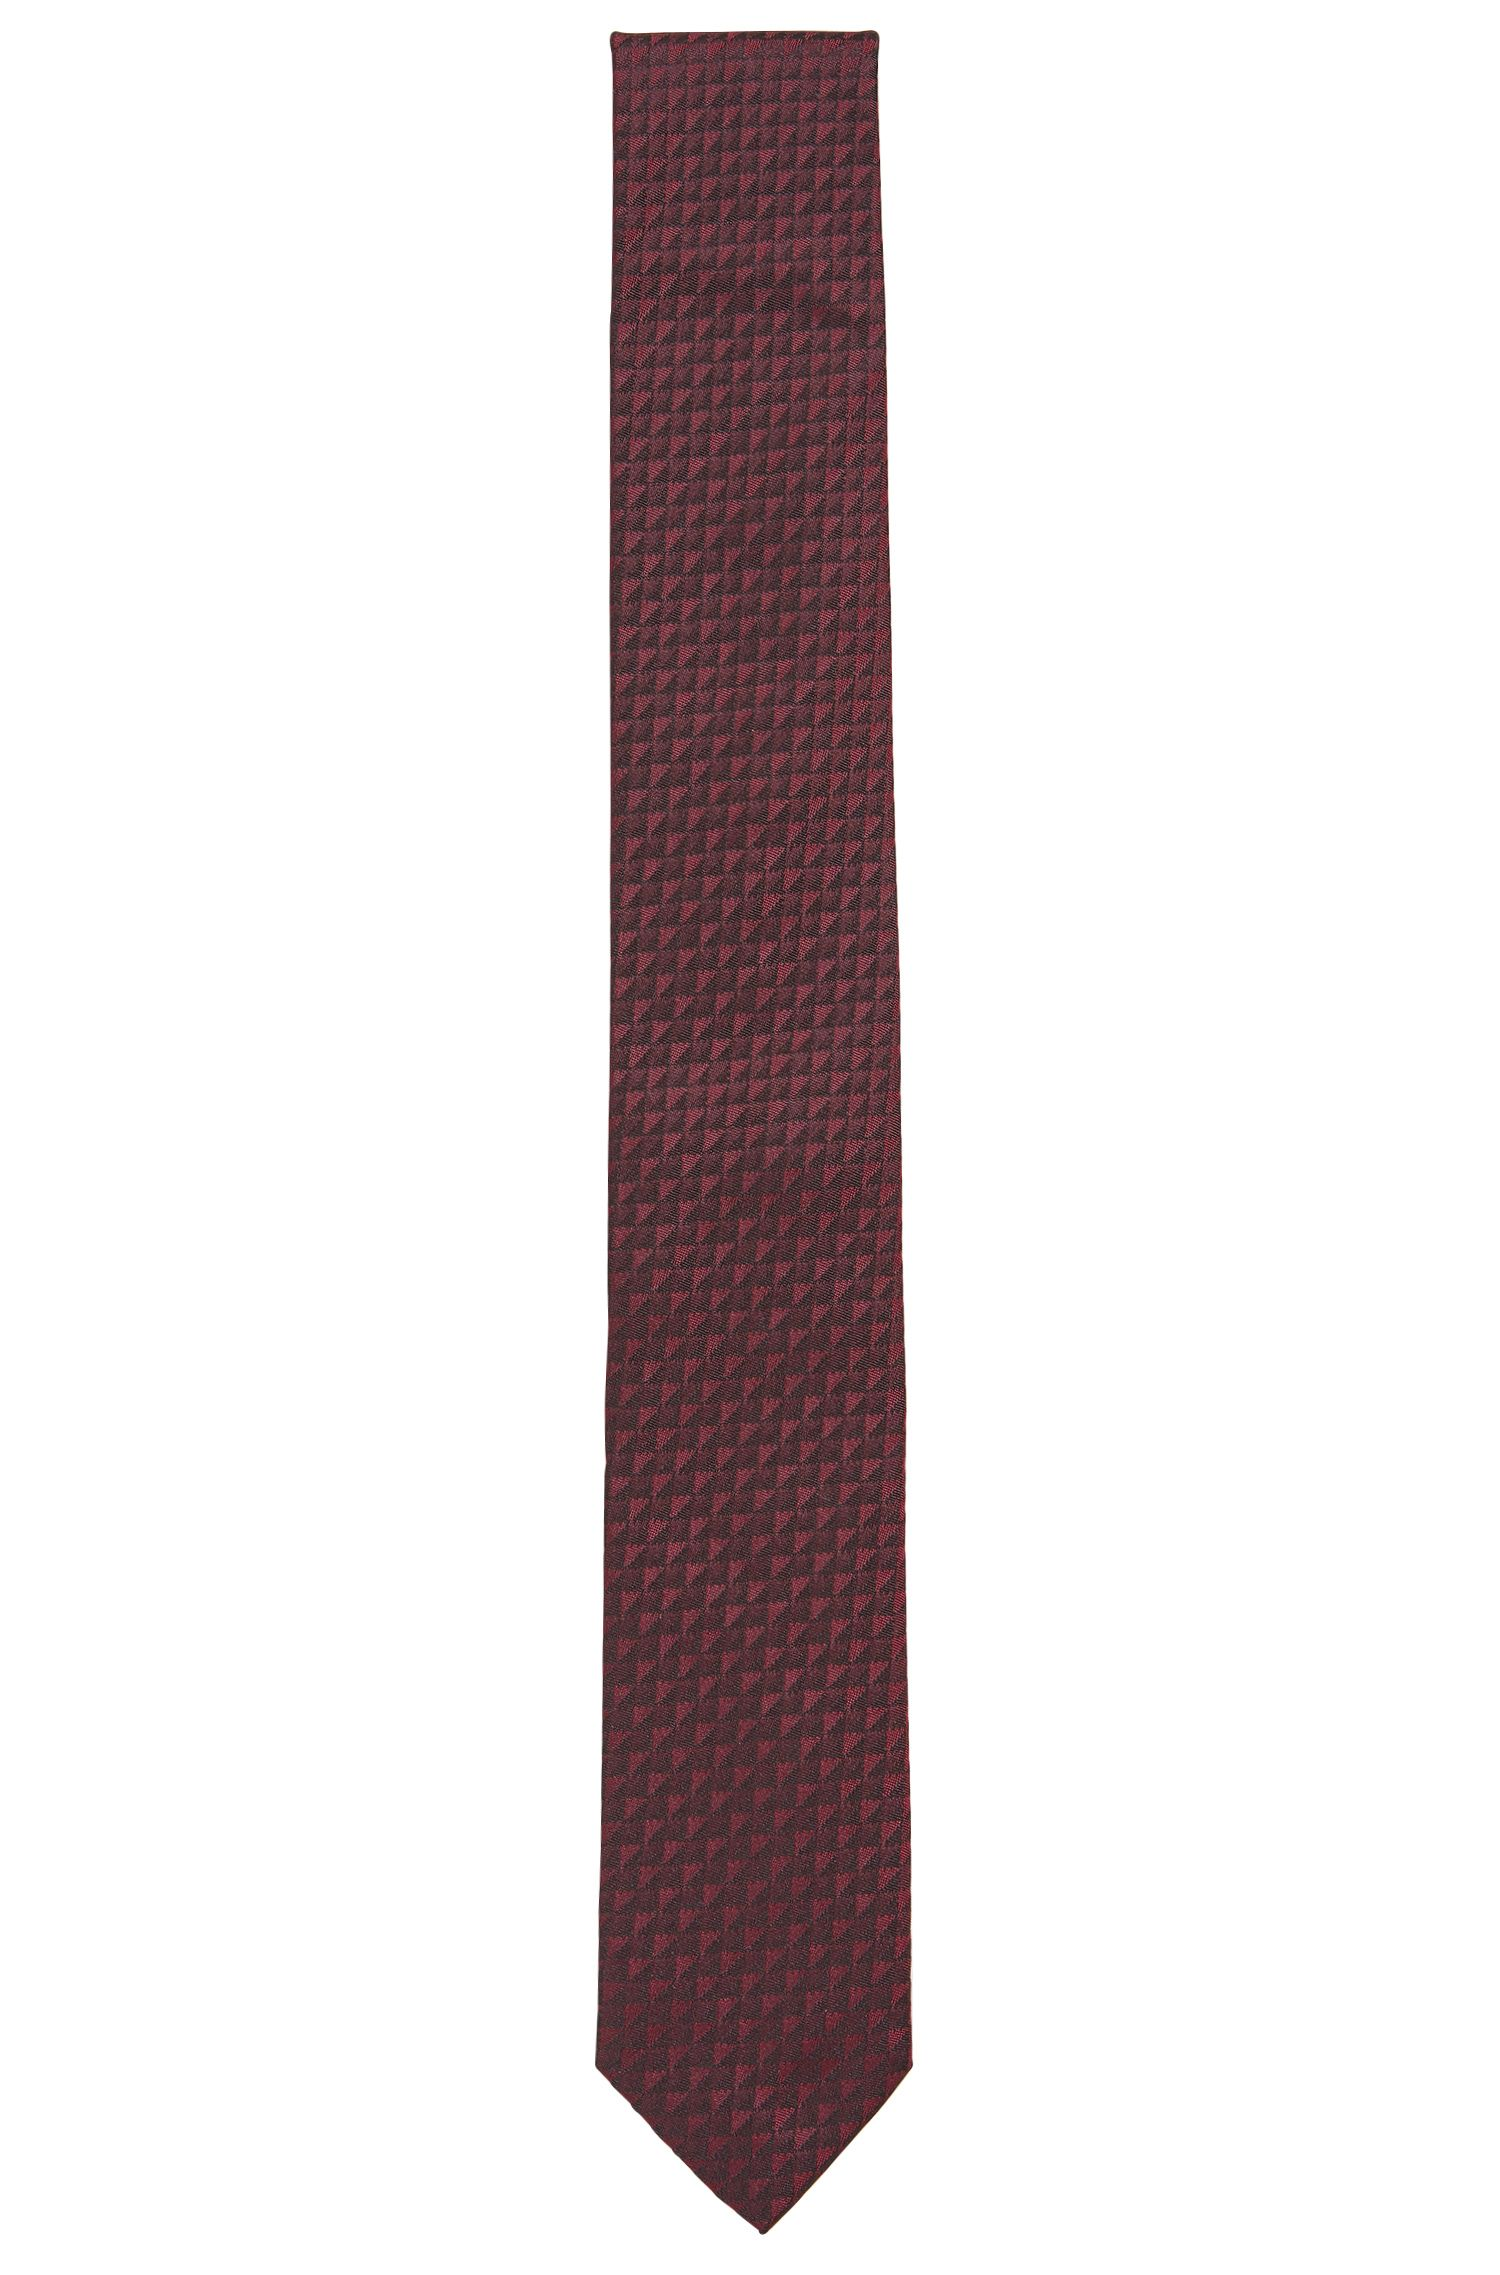 Krawatte aus Seiden-Jacquard mit feinem 3D-Muster